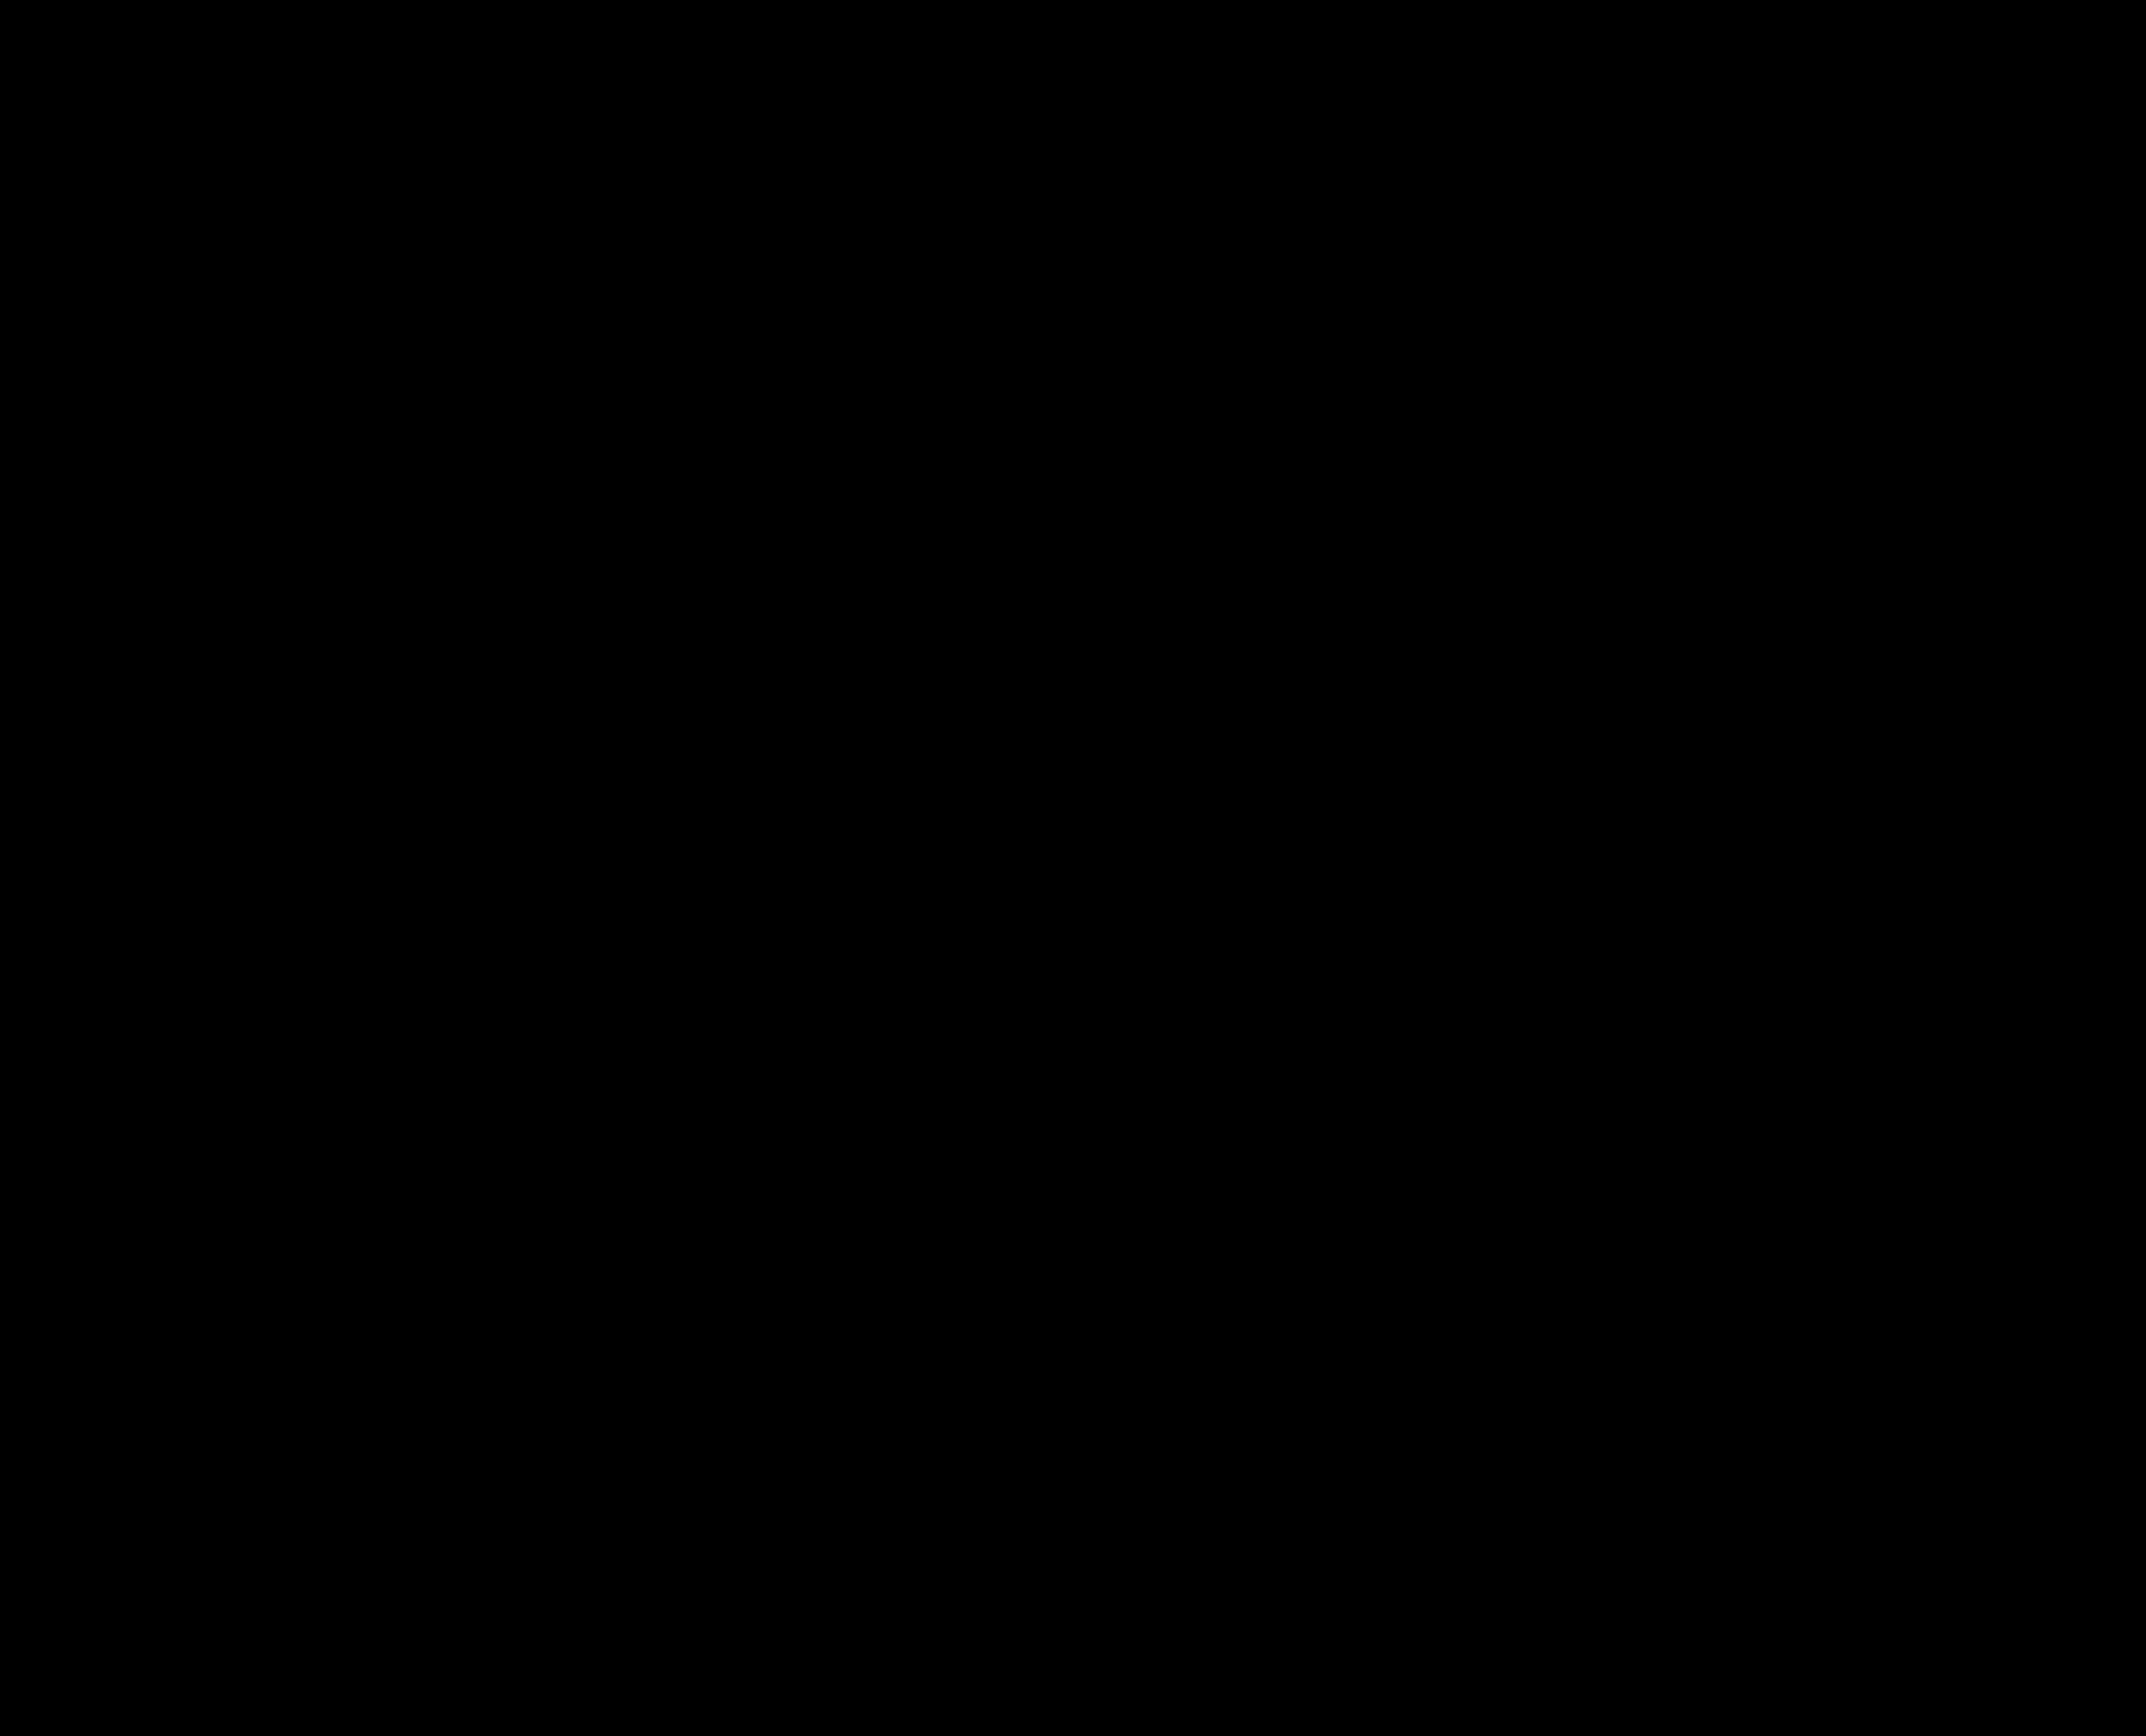 PNG Lawyer Symbols Transparent Lawyer Symbols.PNG Images.